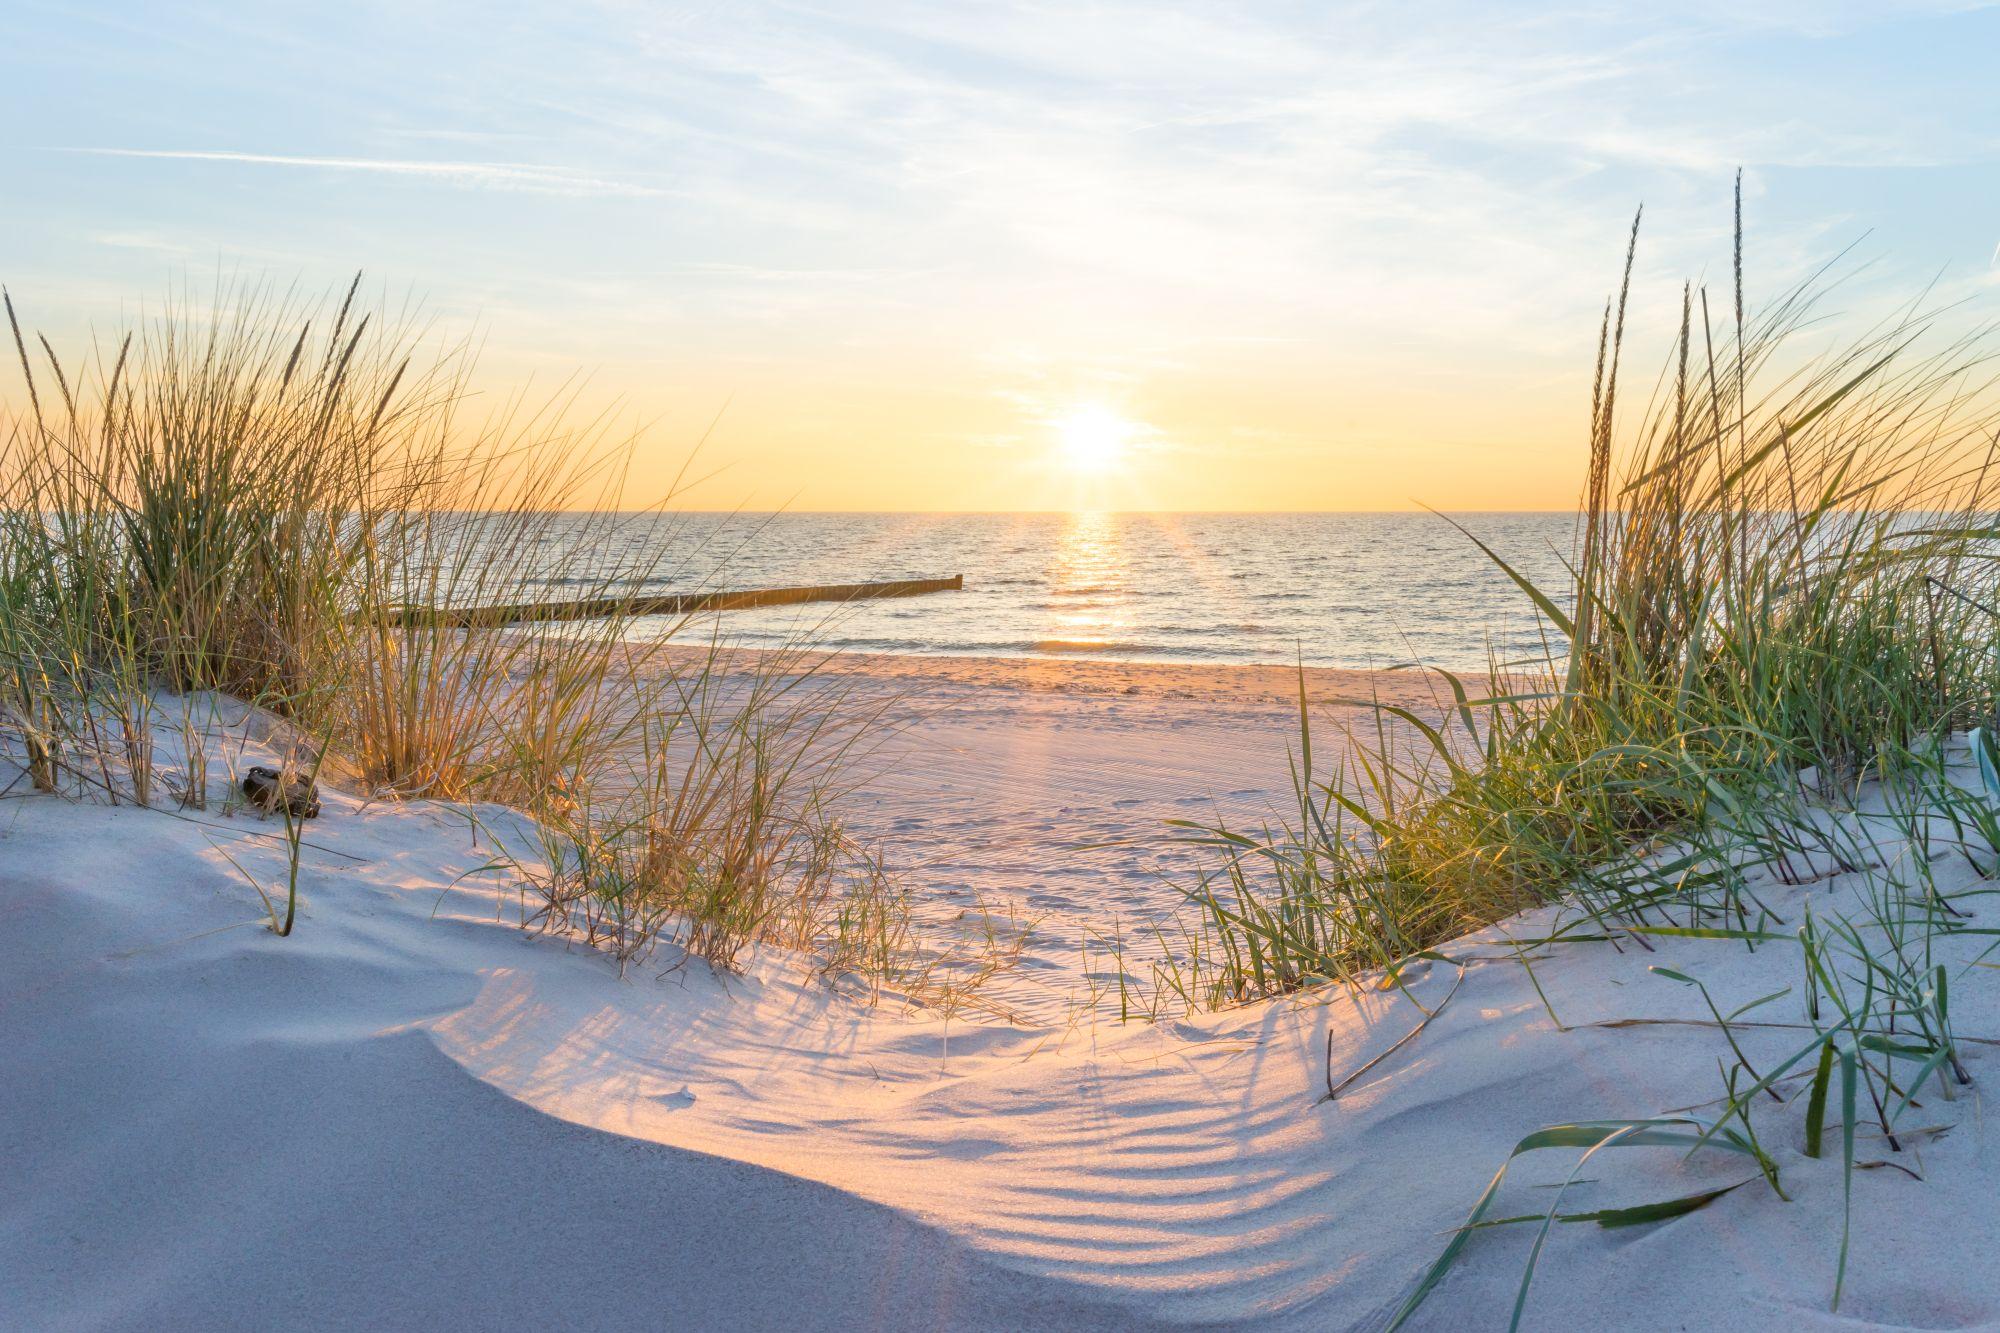 Bałtyk widok plaży